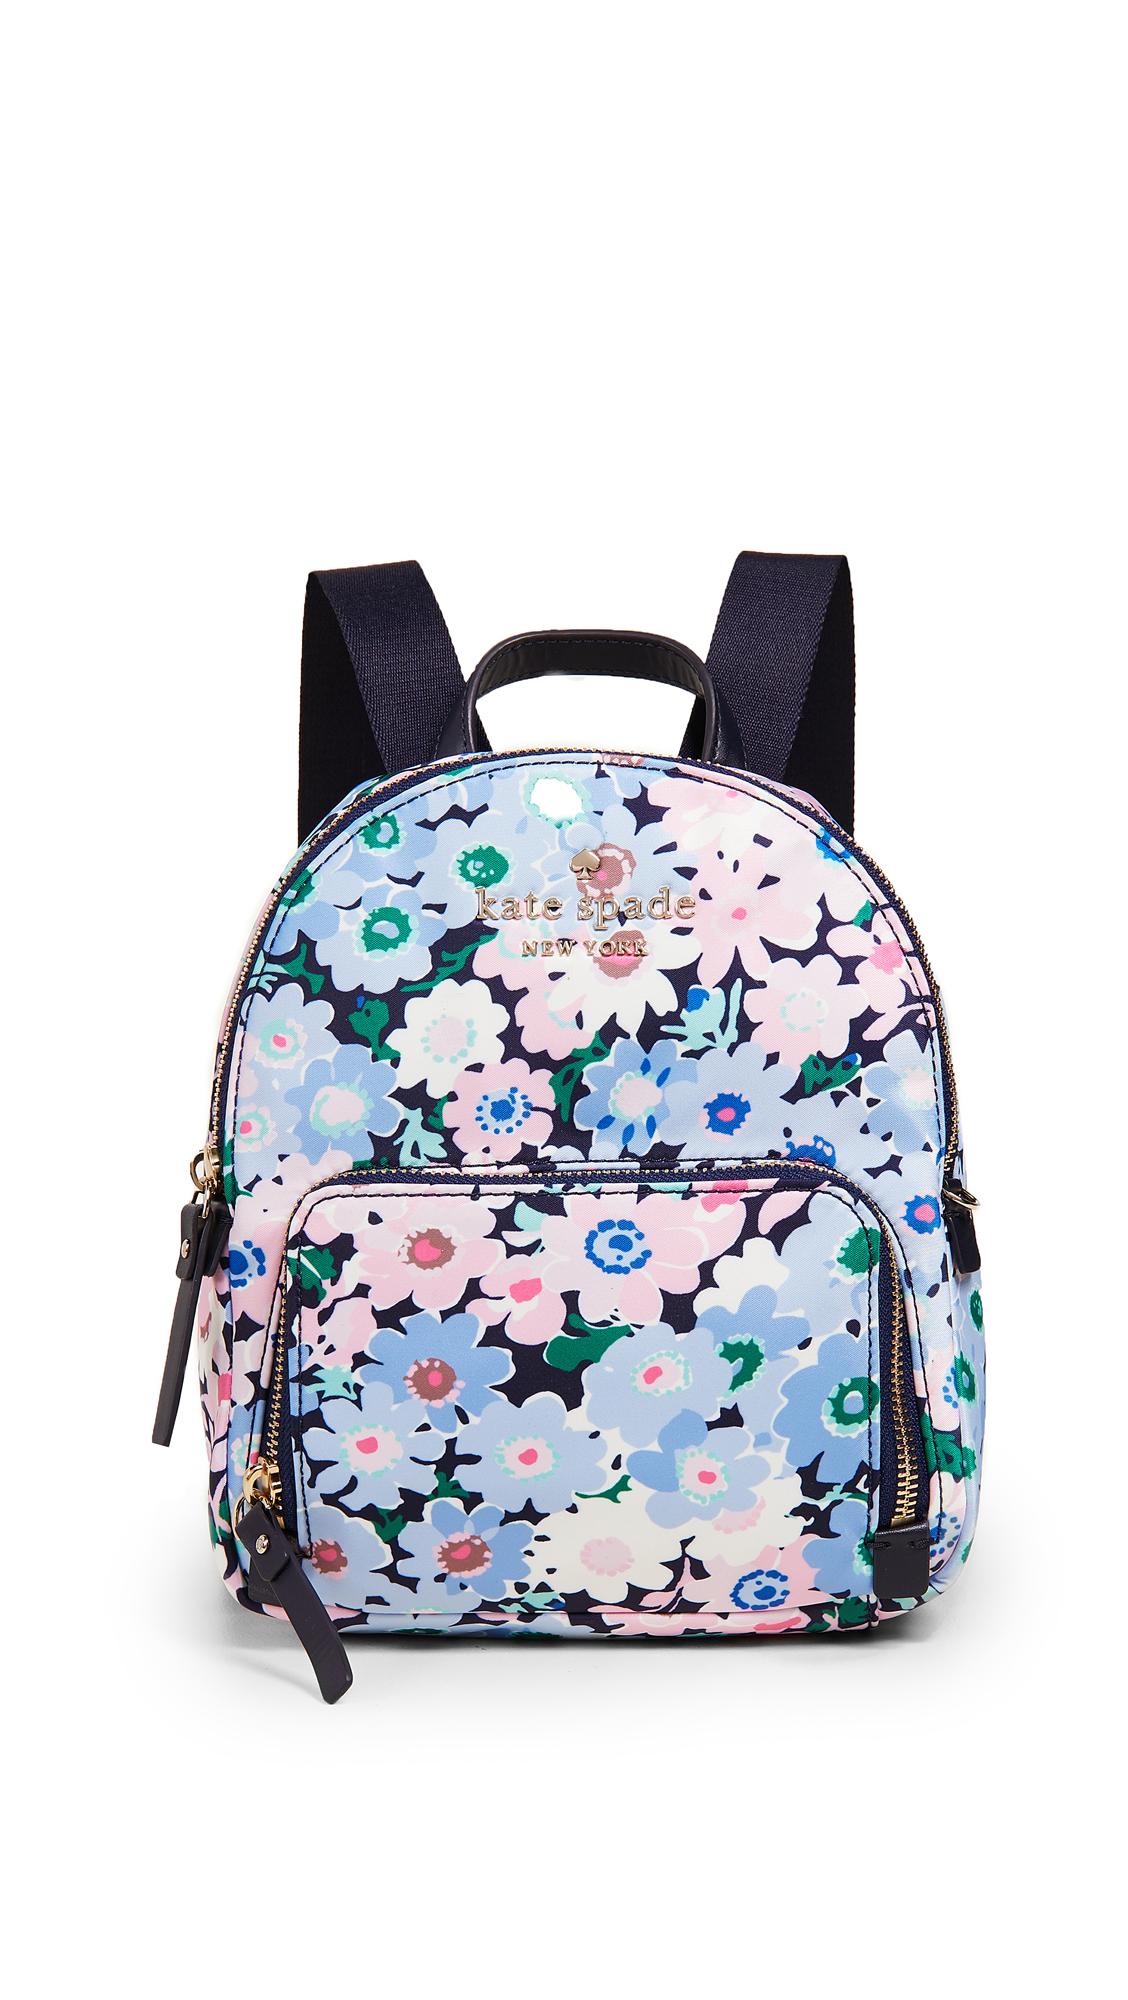 Daisy Garden Small Hartley Backpack, Multi